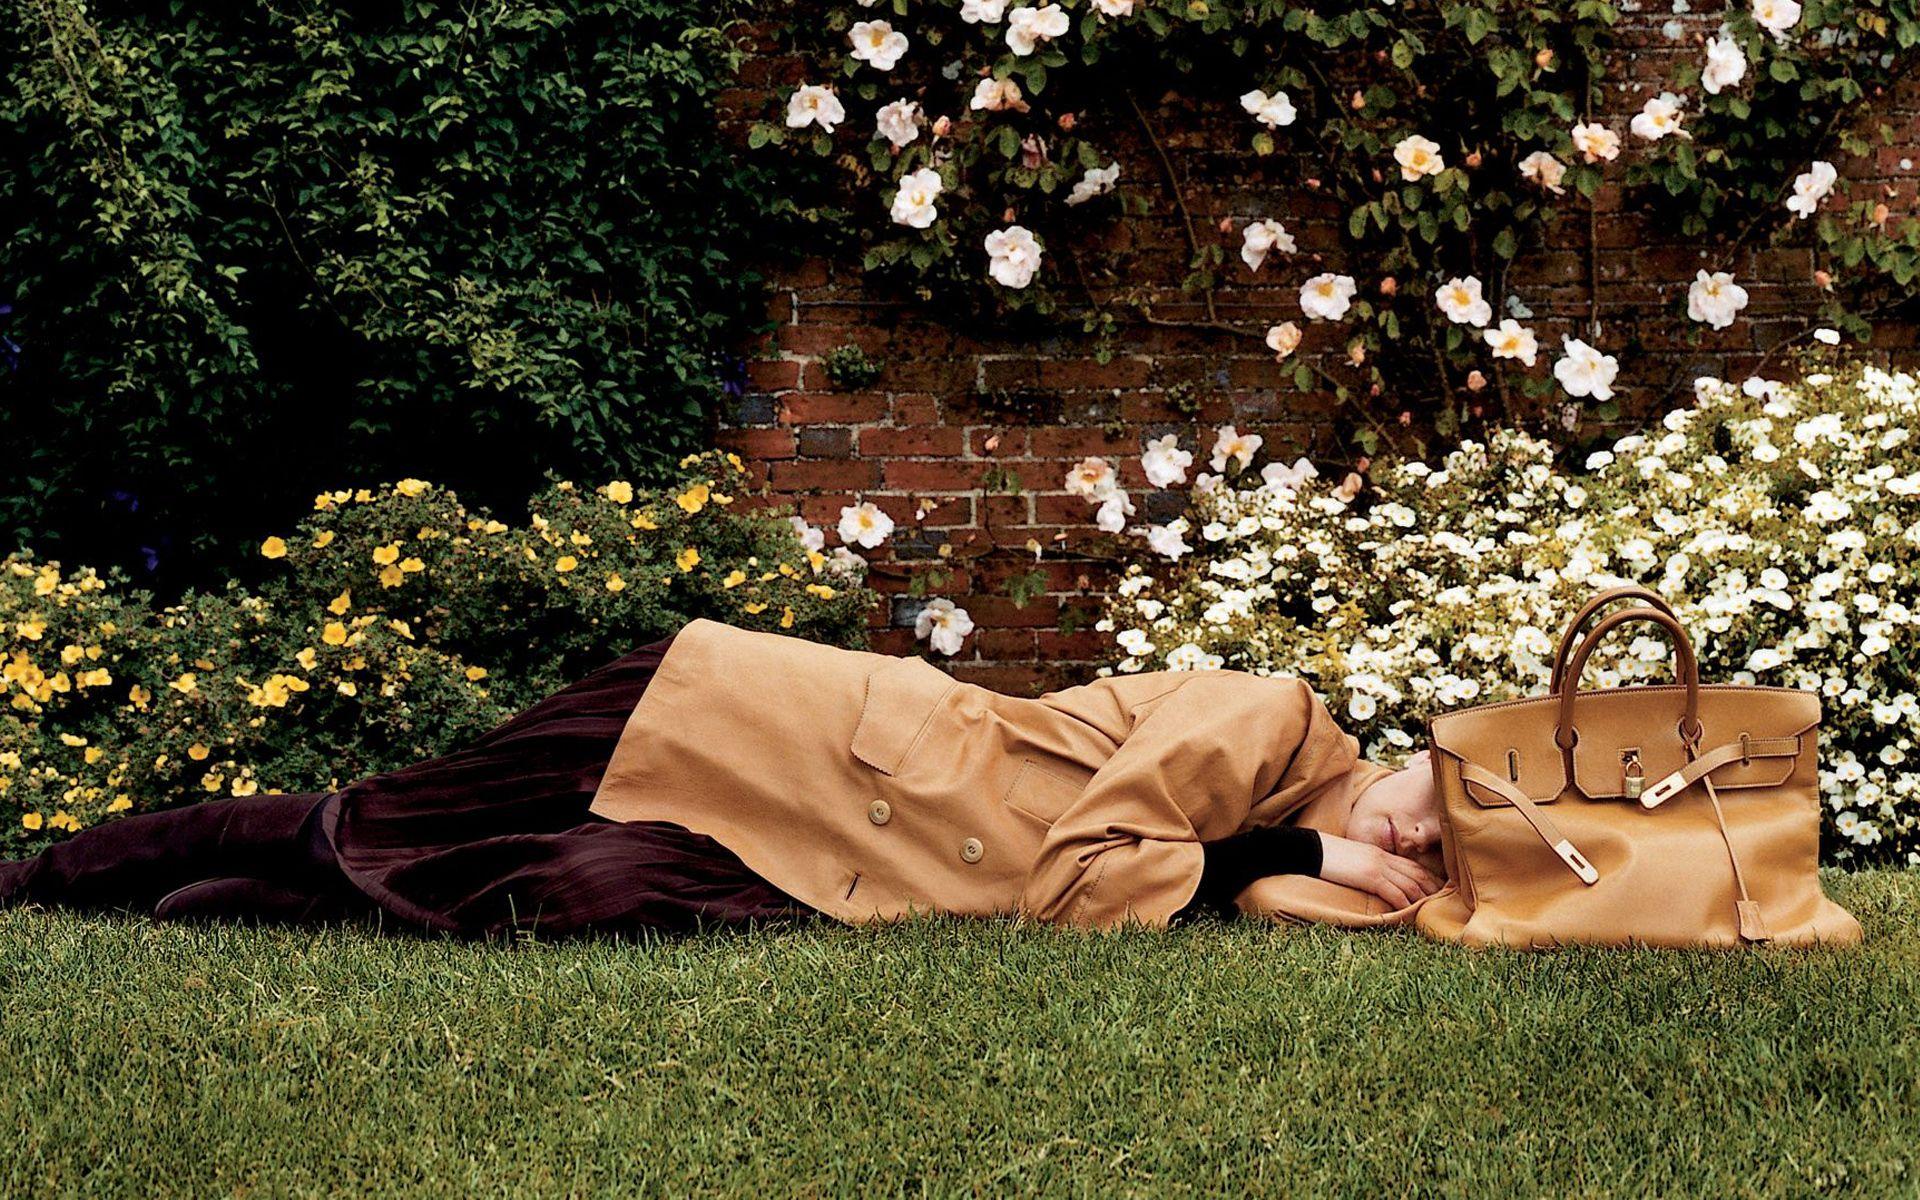 What Makes Hermès Birkin The Ultimate Status Symbol Of The Super-Rich